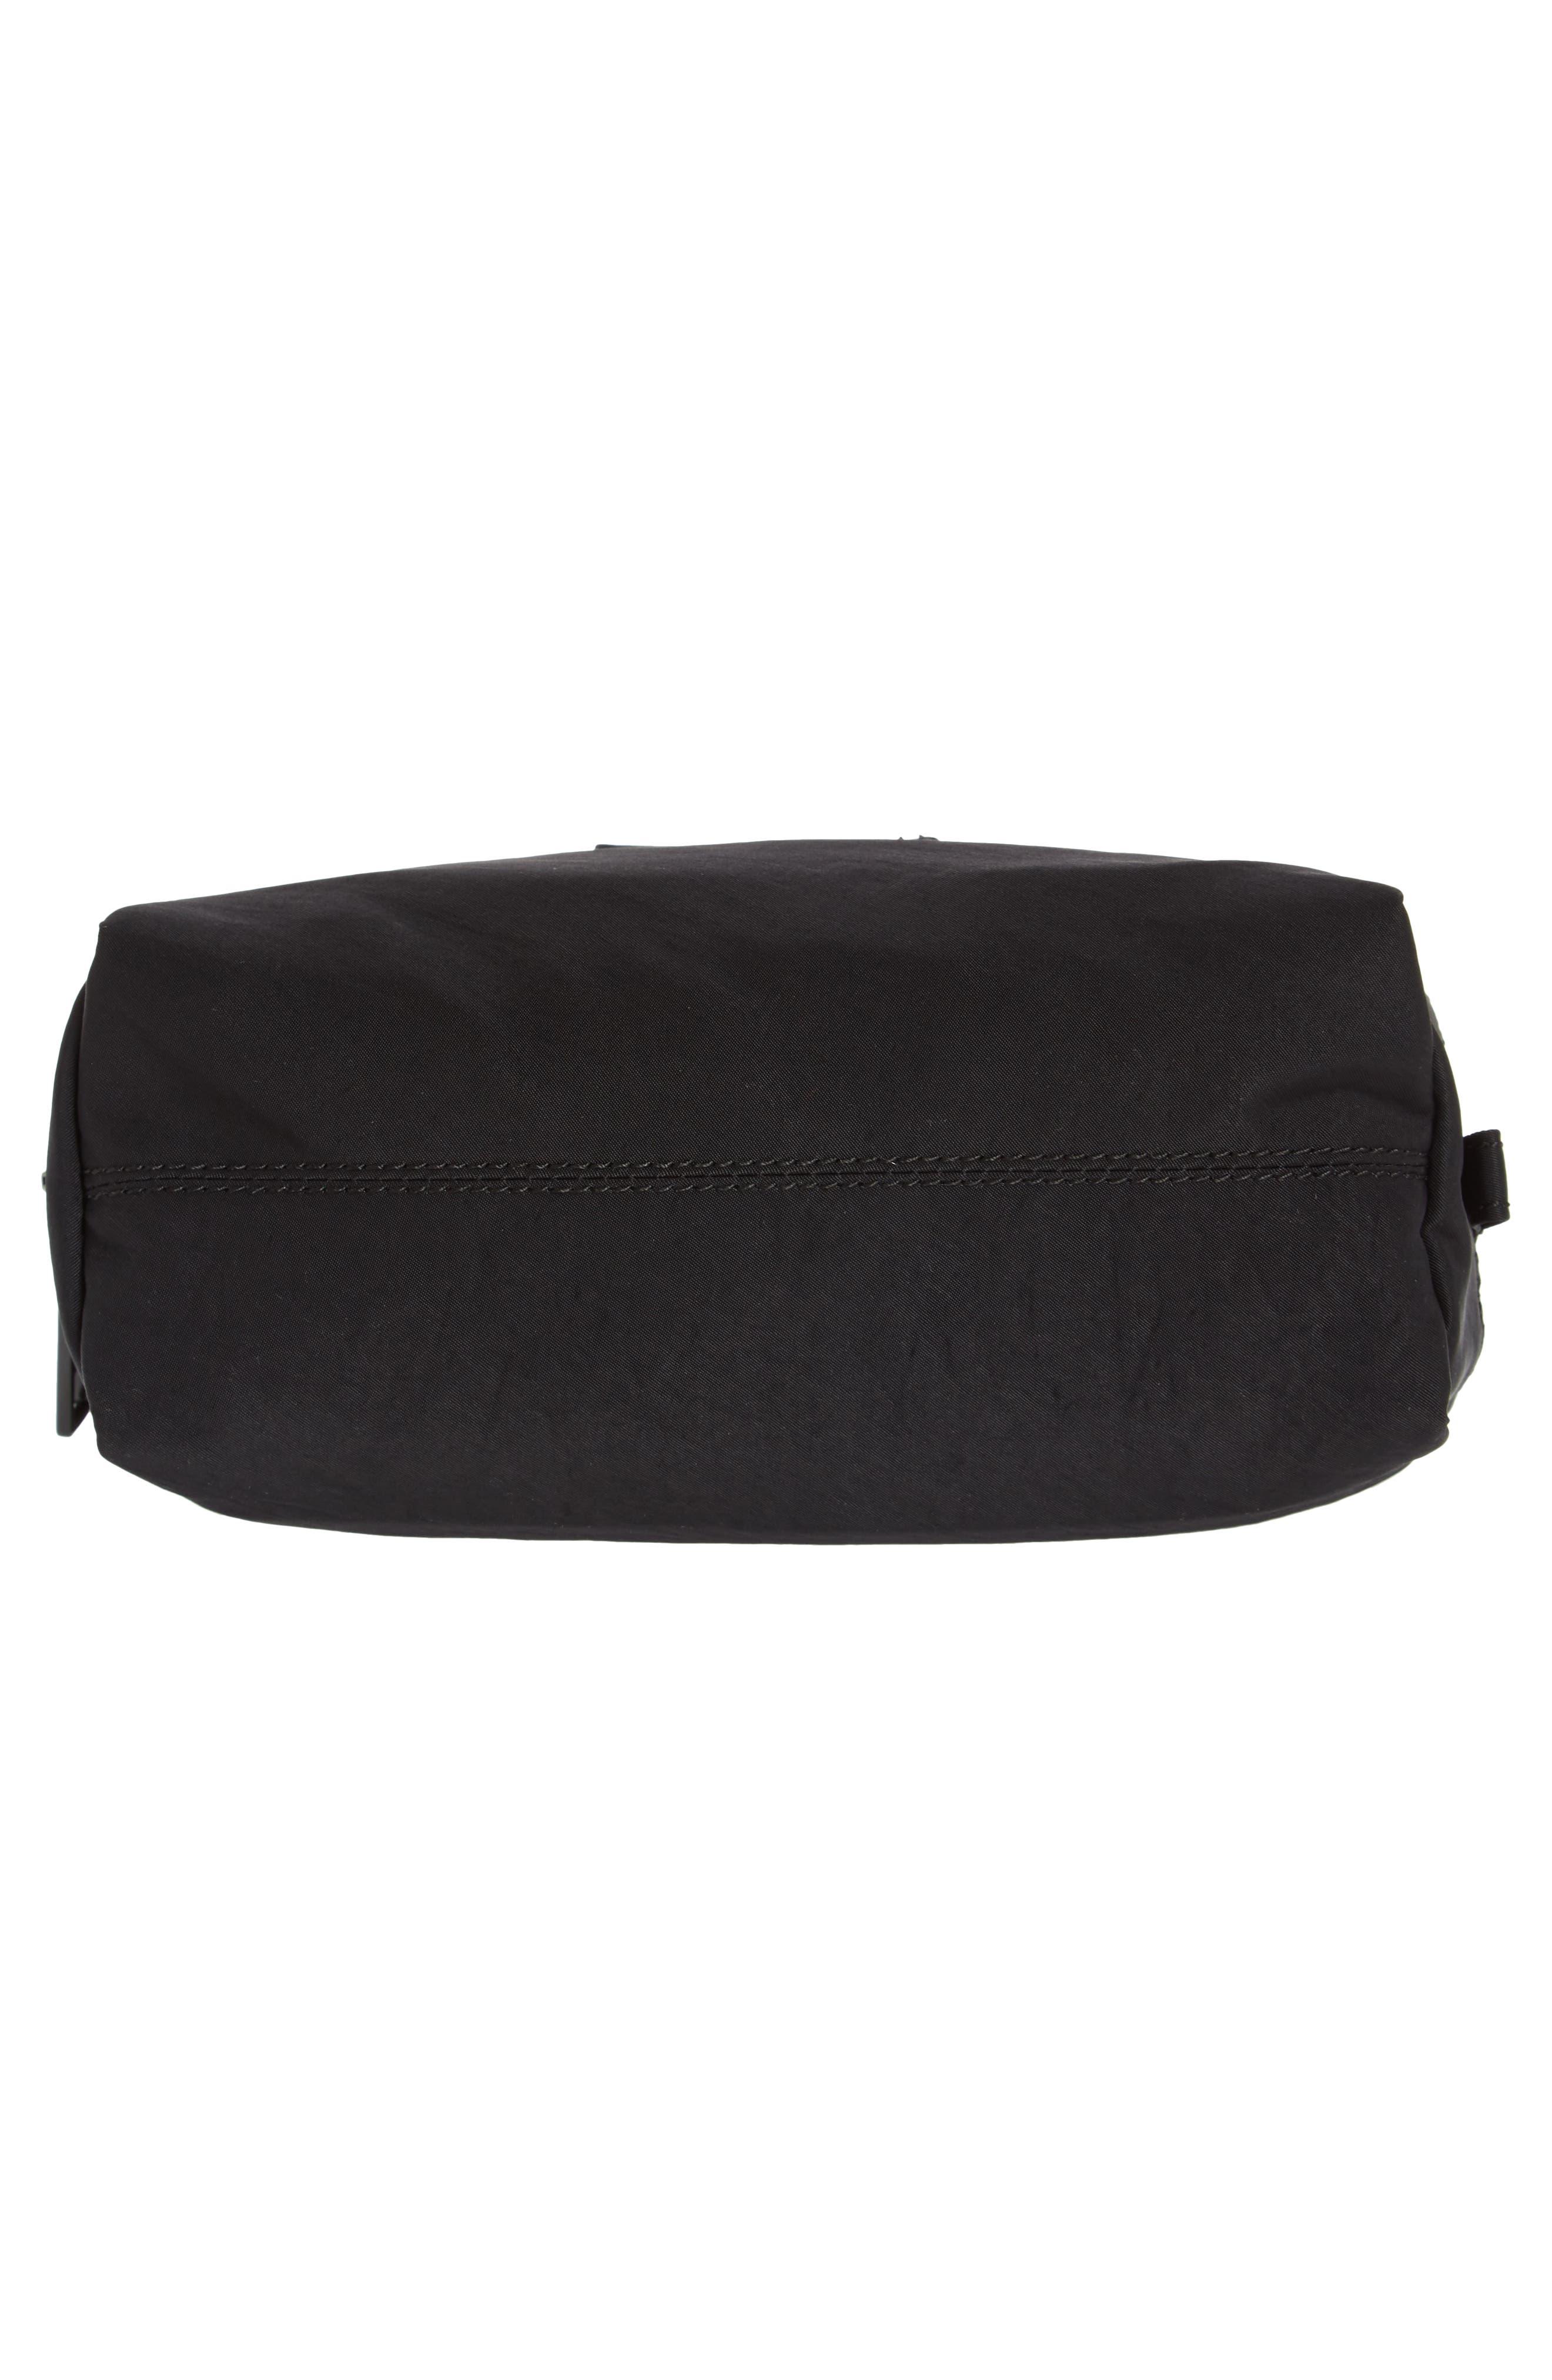 Nylon Cosmetics Pouch,                             Alternate thumbnail 5, color,                             Black